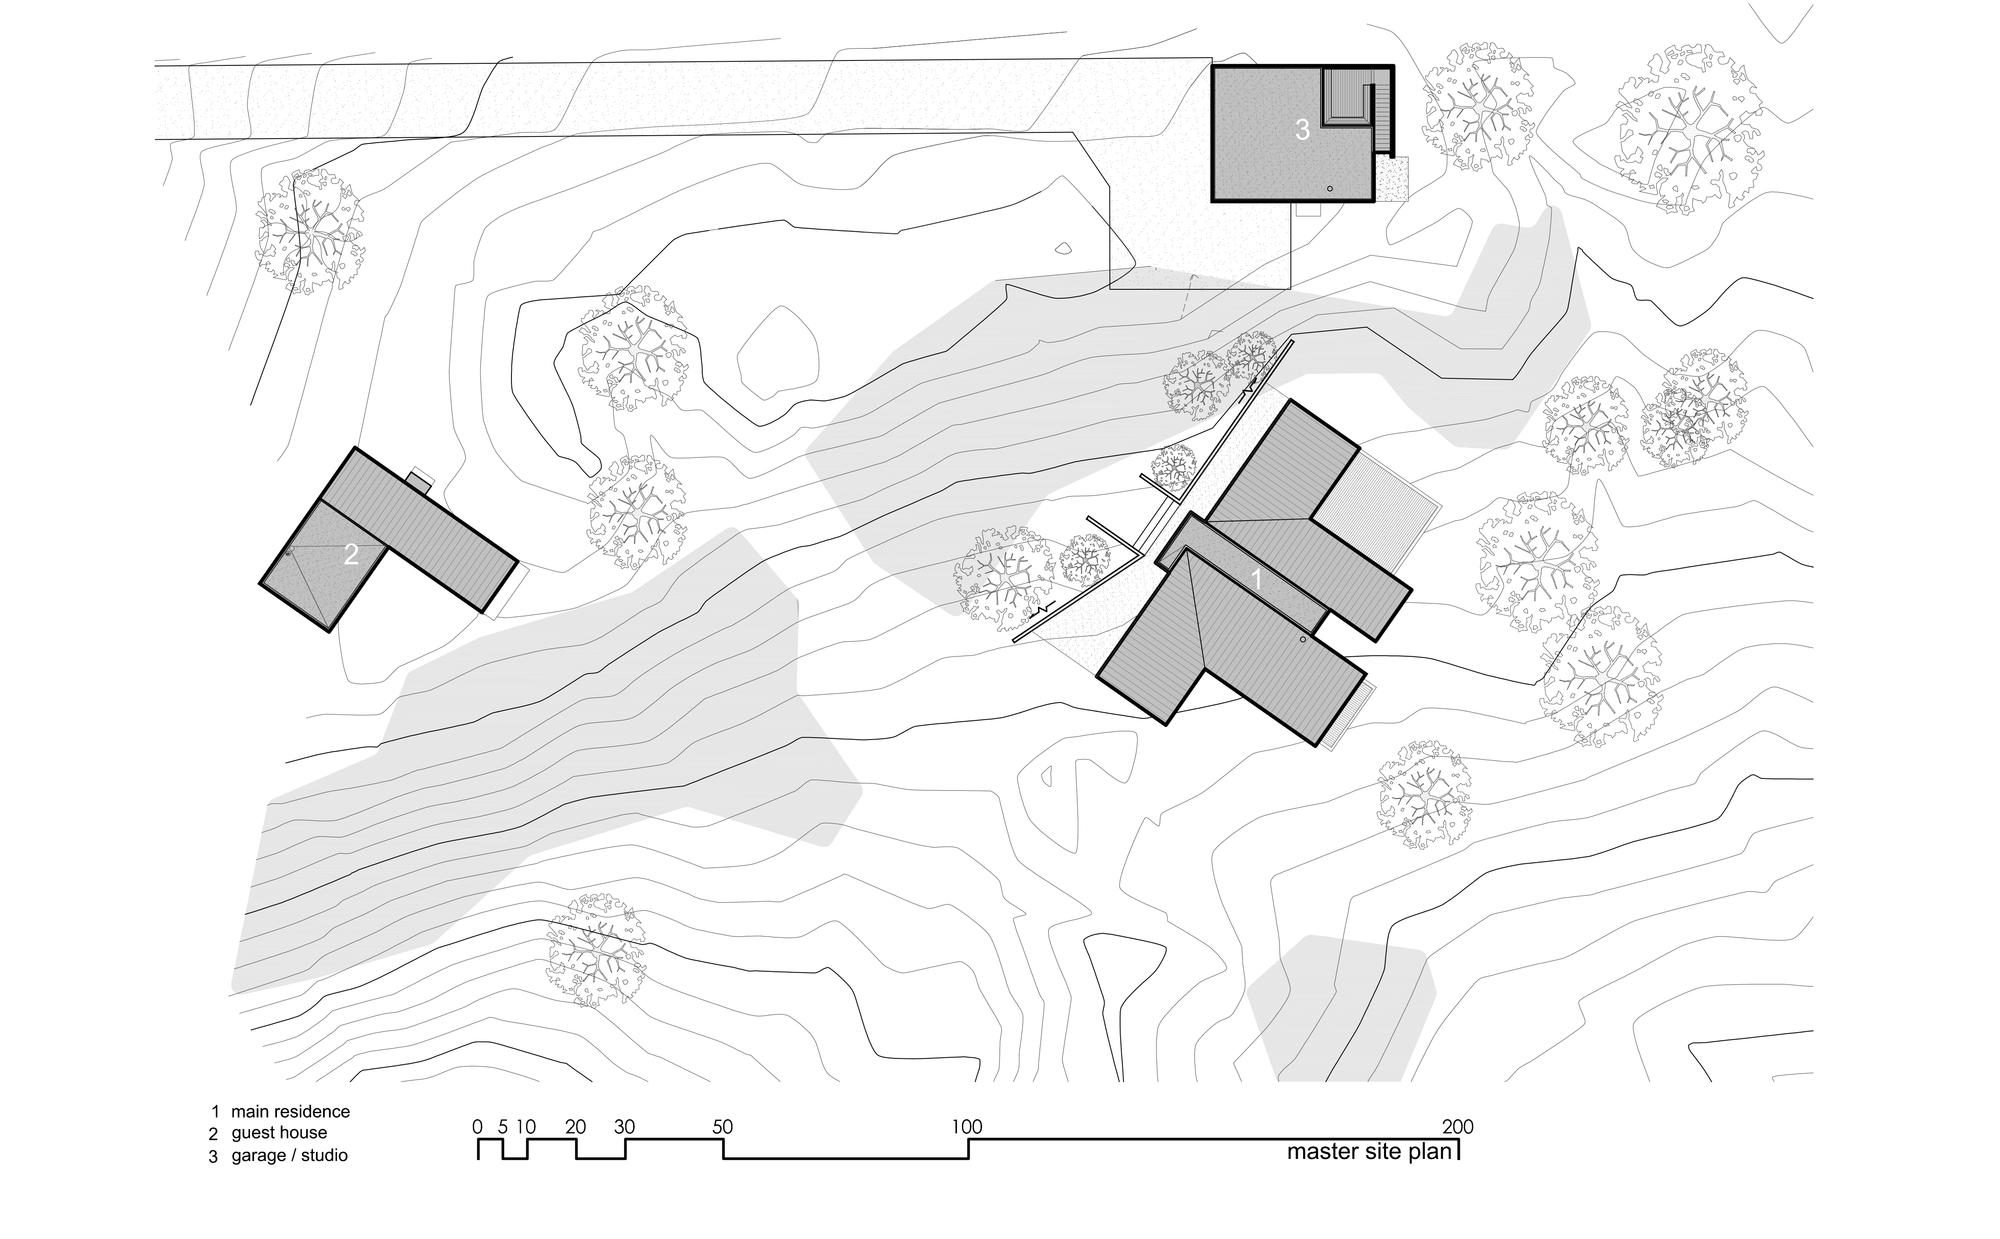 5522fd5ee58ecea9f8000058_capitol-reef-desert-dwelling-imbue-design_30_master_site_plan